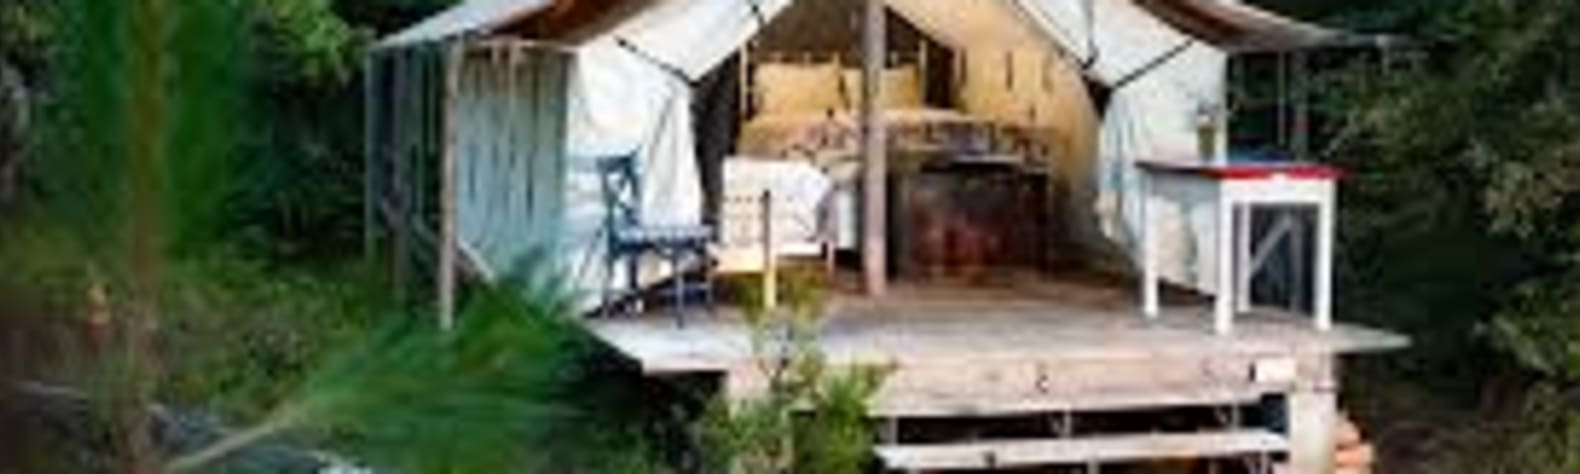 Winterberry Farm's wall tent